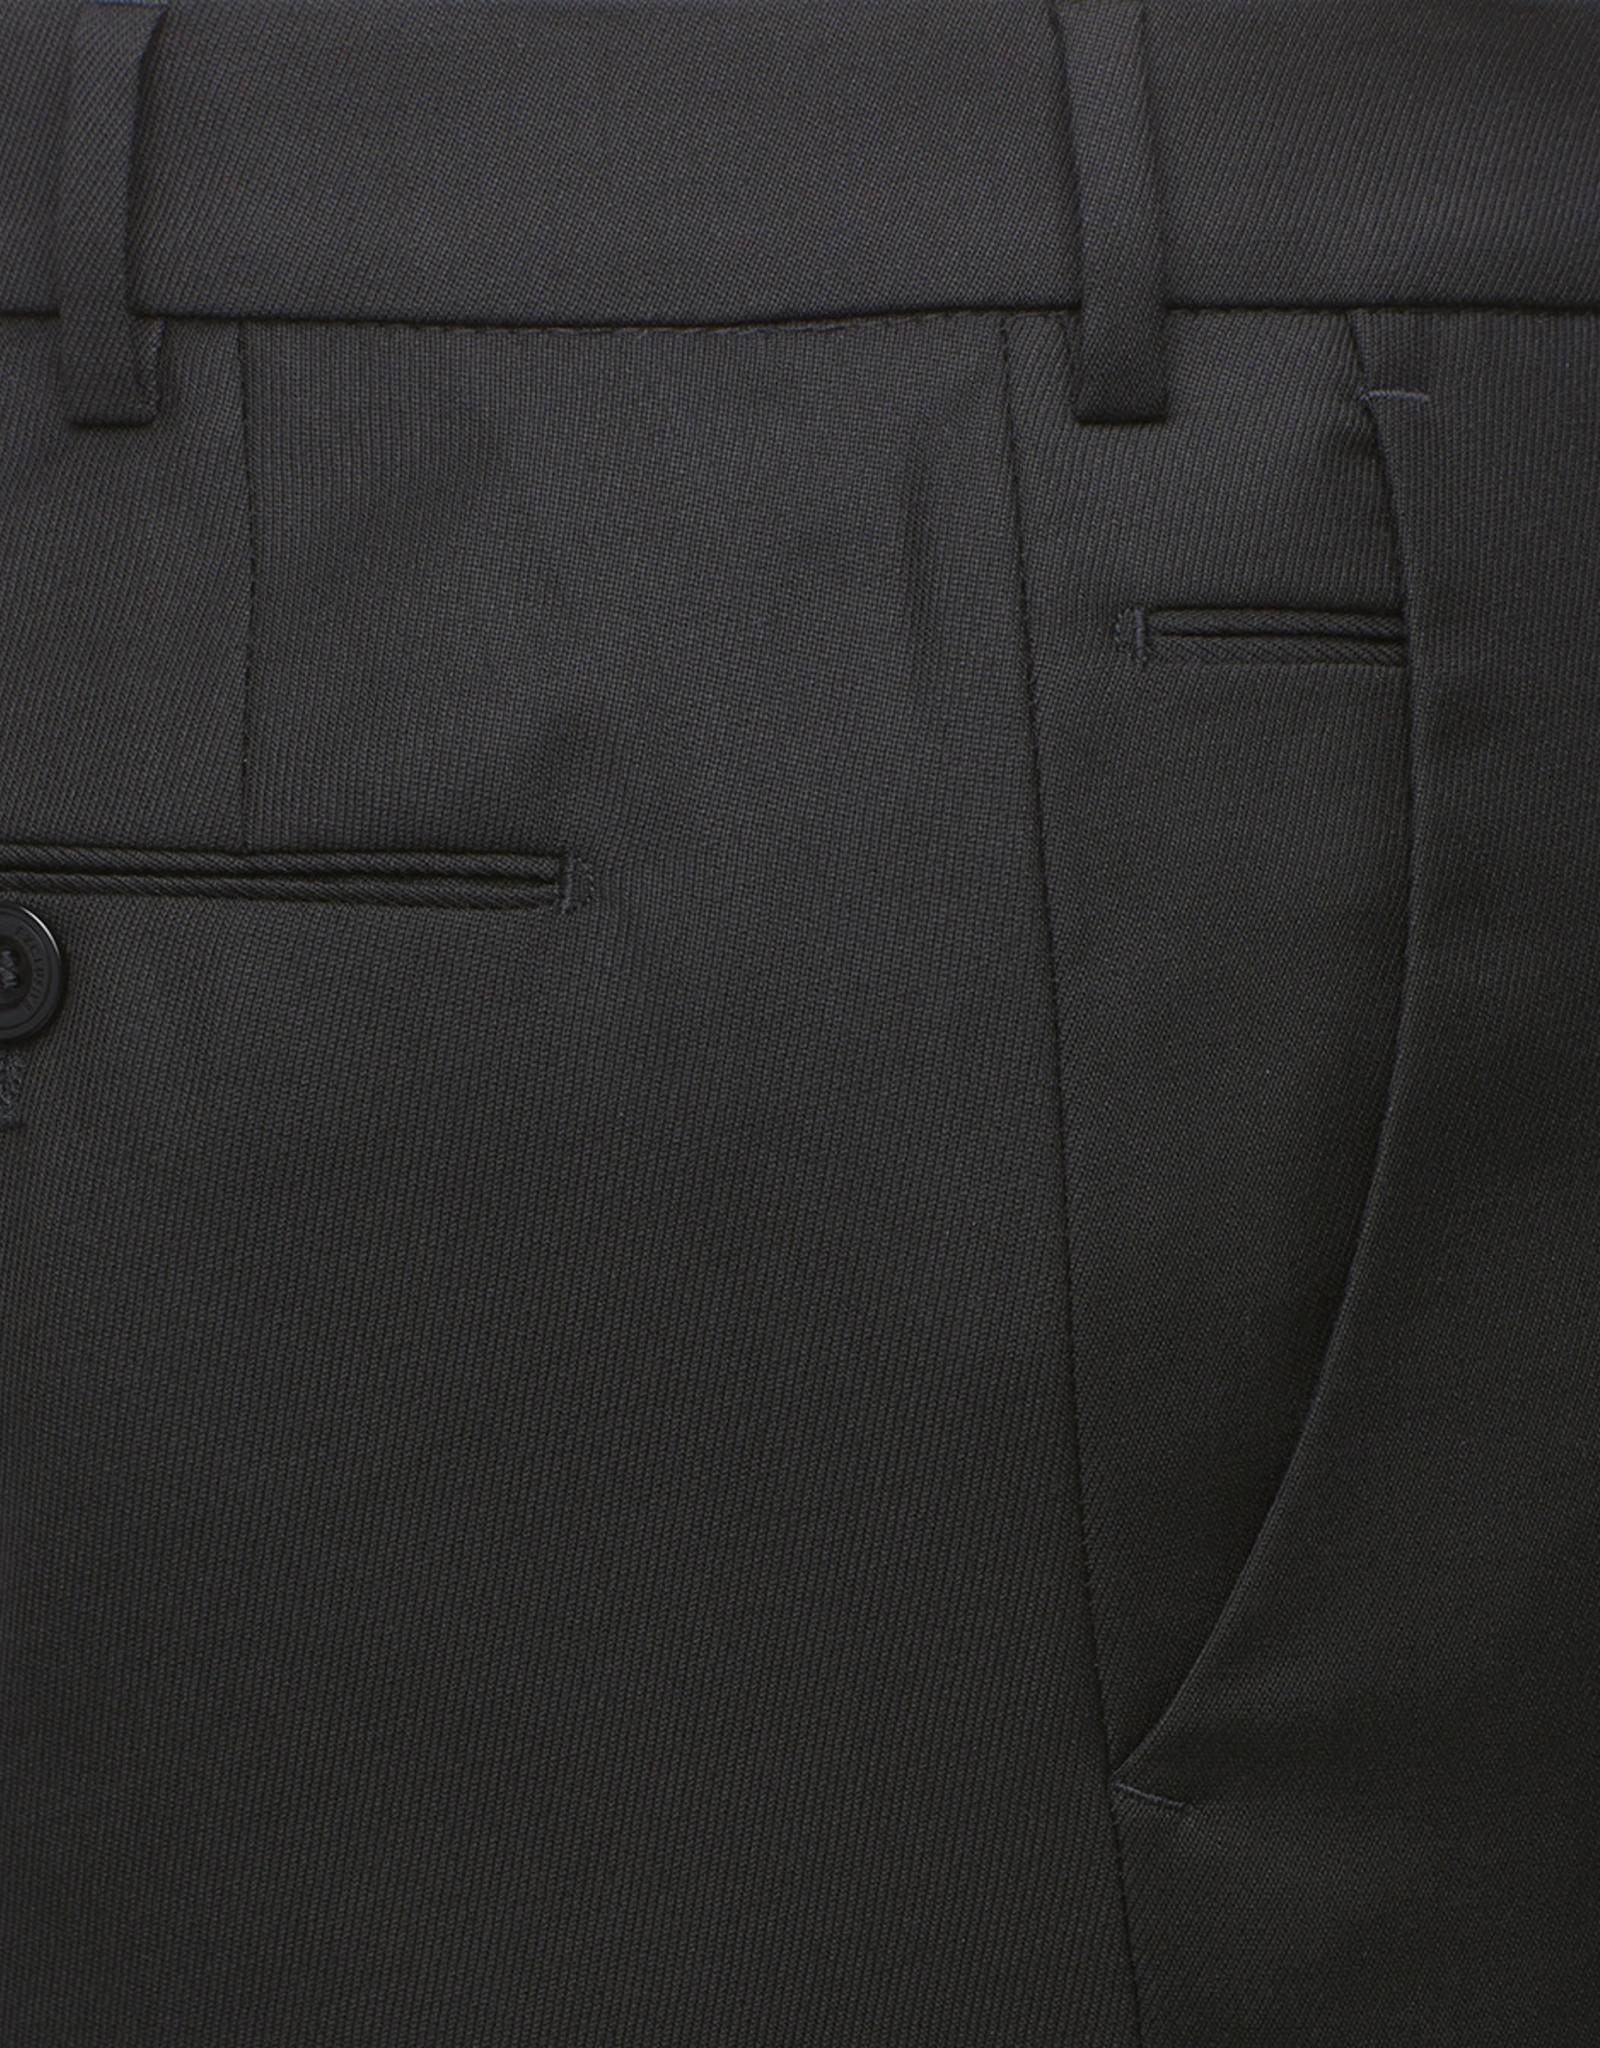 Meyer Exclusive Meyer Exclusive broek wol zwart Bonn 8400/09